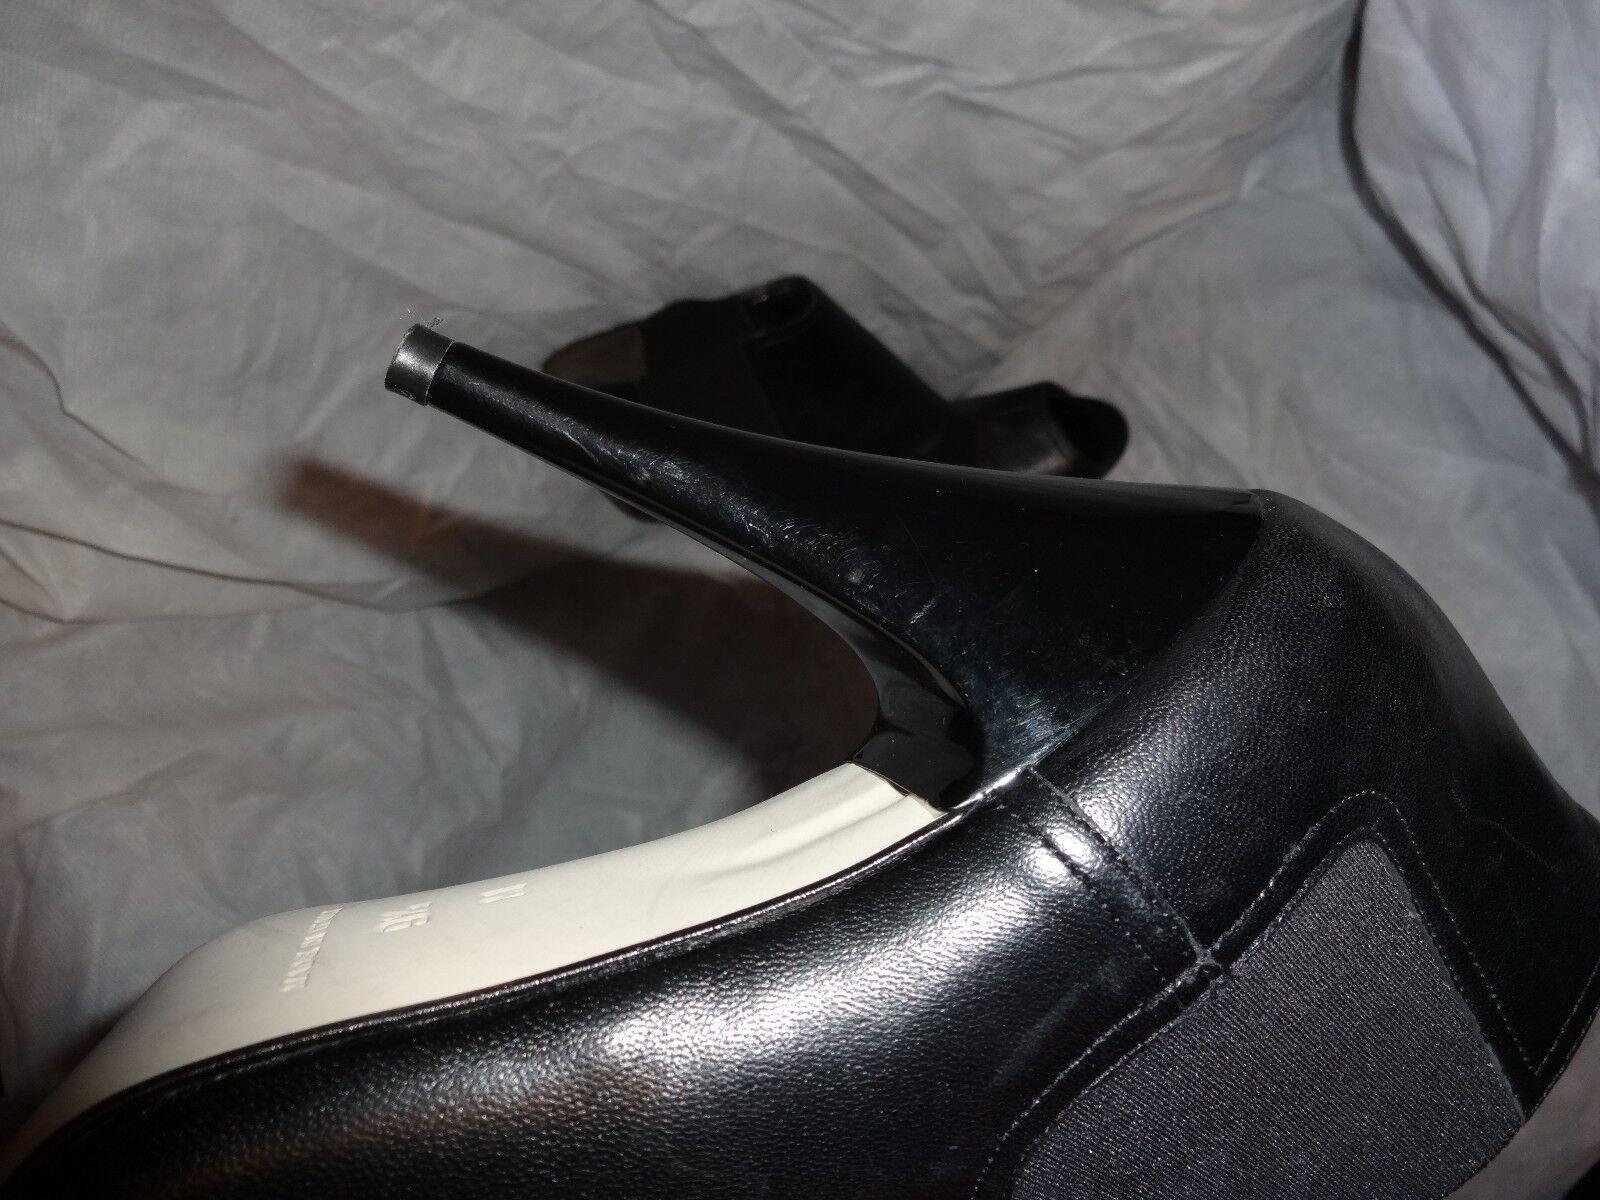 MICHAEL KOR WOMEN BLACK LEATHER TOE SLIP ON HEEL PEEP TOE LEATHER SIZE UK 6.5 EU 39.5 US 9.5 8c0e4f